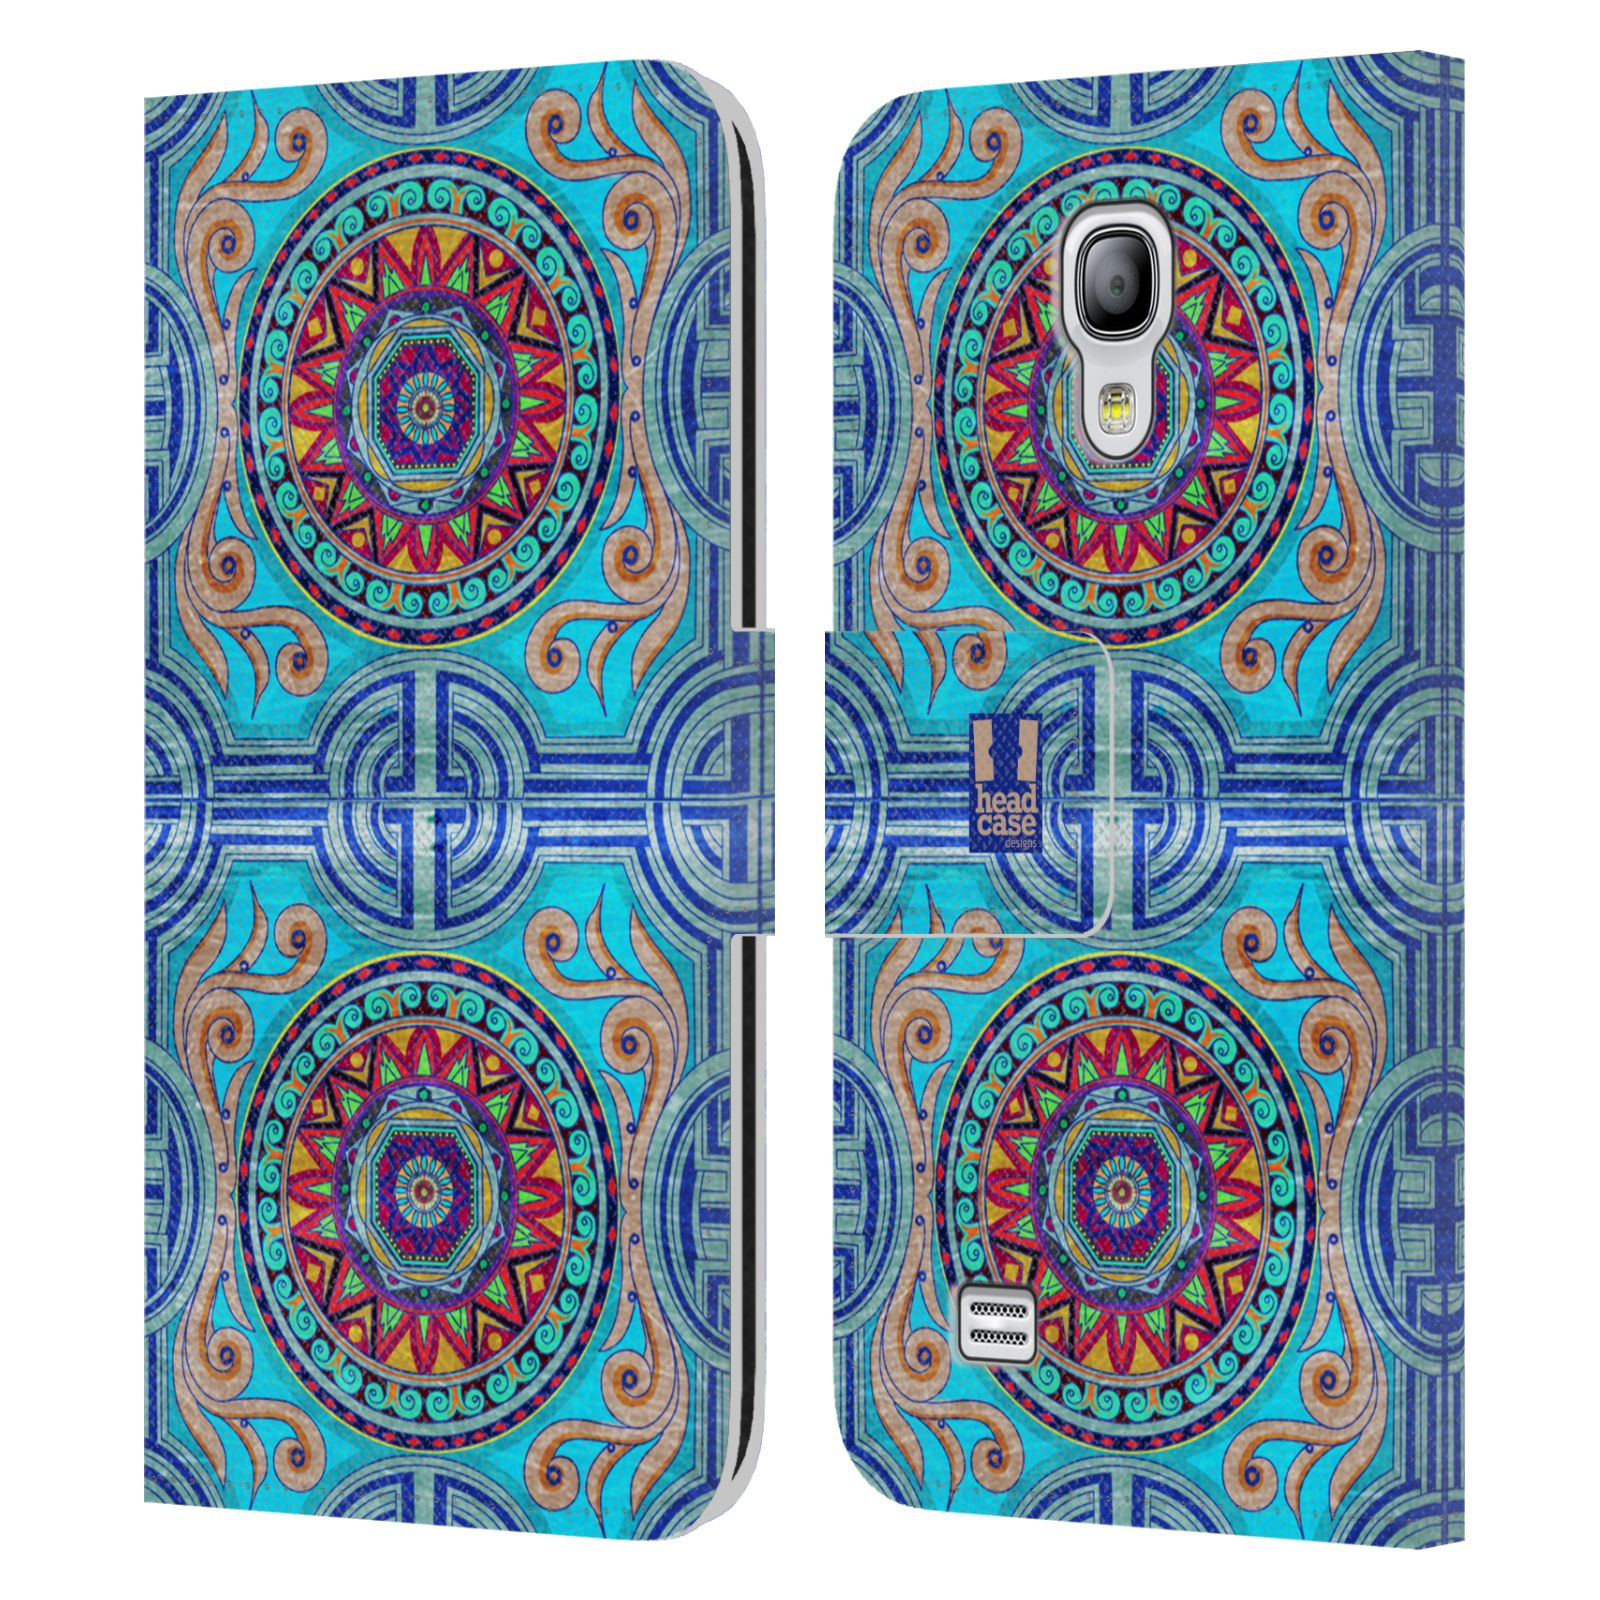 HEAD CASE Flipové pouzdro pro mobil Samsung Galaxy S4 MINI / S4 MINI DUOS ARABESKA modrá